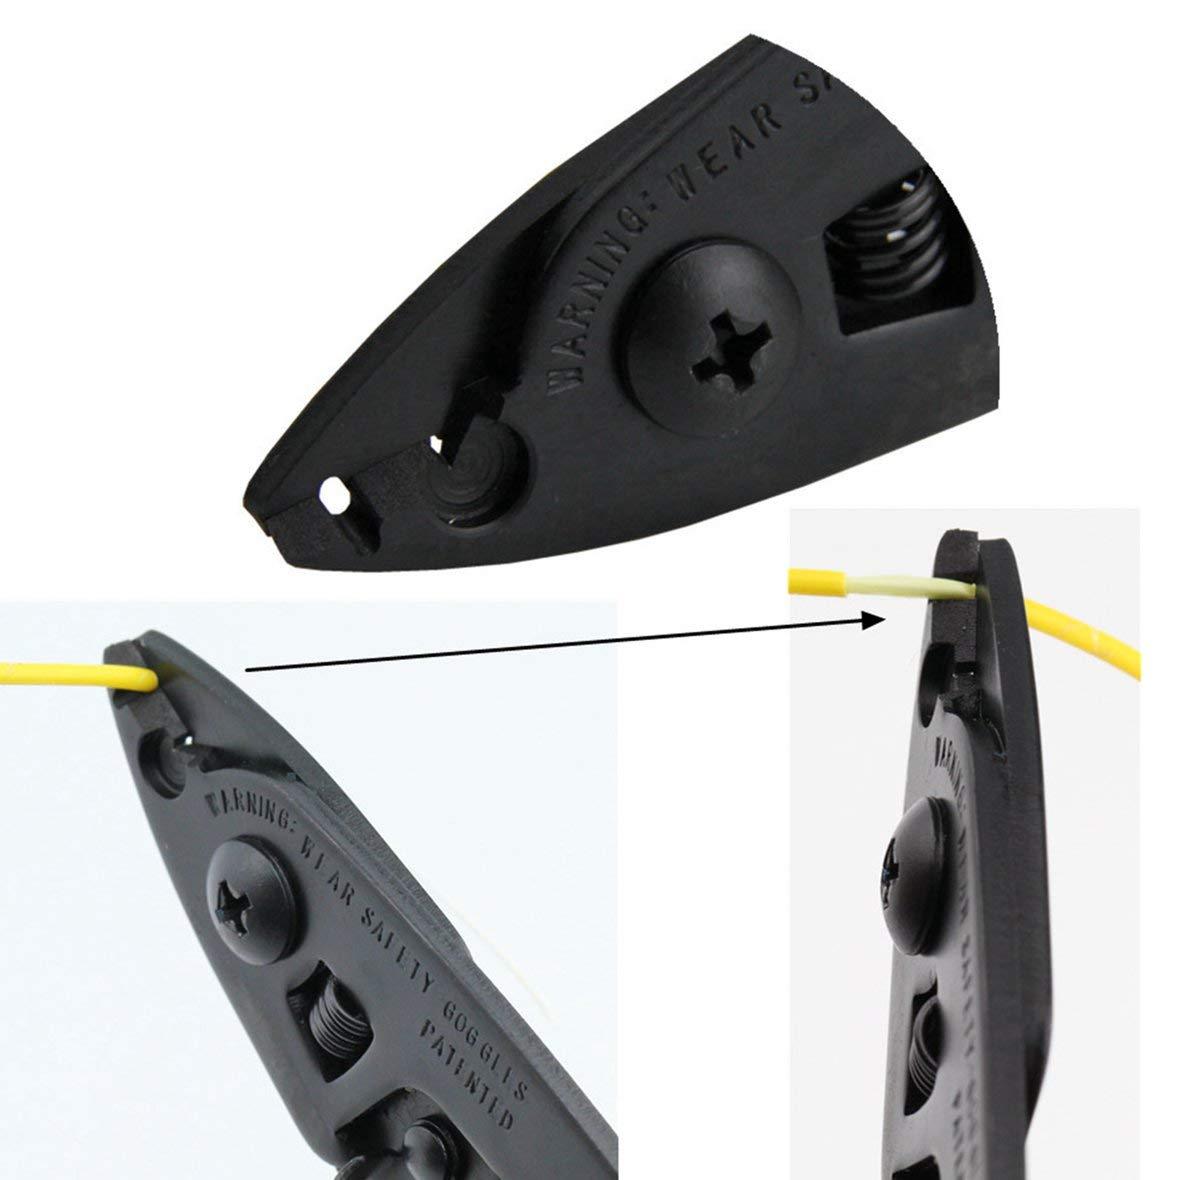 Heaviesk Fiber Optic Stripper CFS-2 Fiber Optic Stripper 2 orificios Fiber Cable Stripper Herramienta FTTH Fibra /óptica Pelacables alicates Alicates